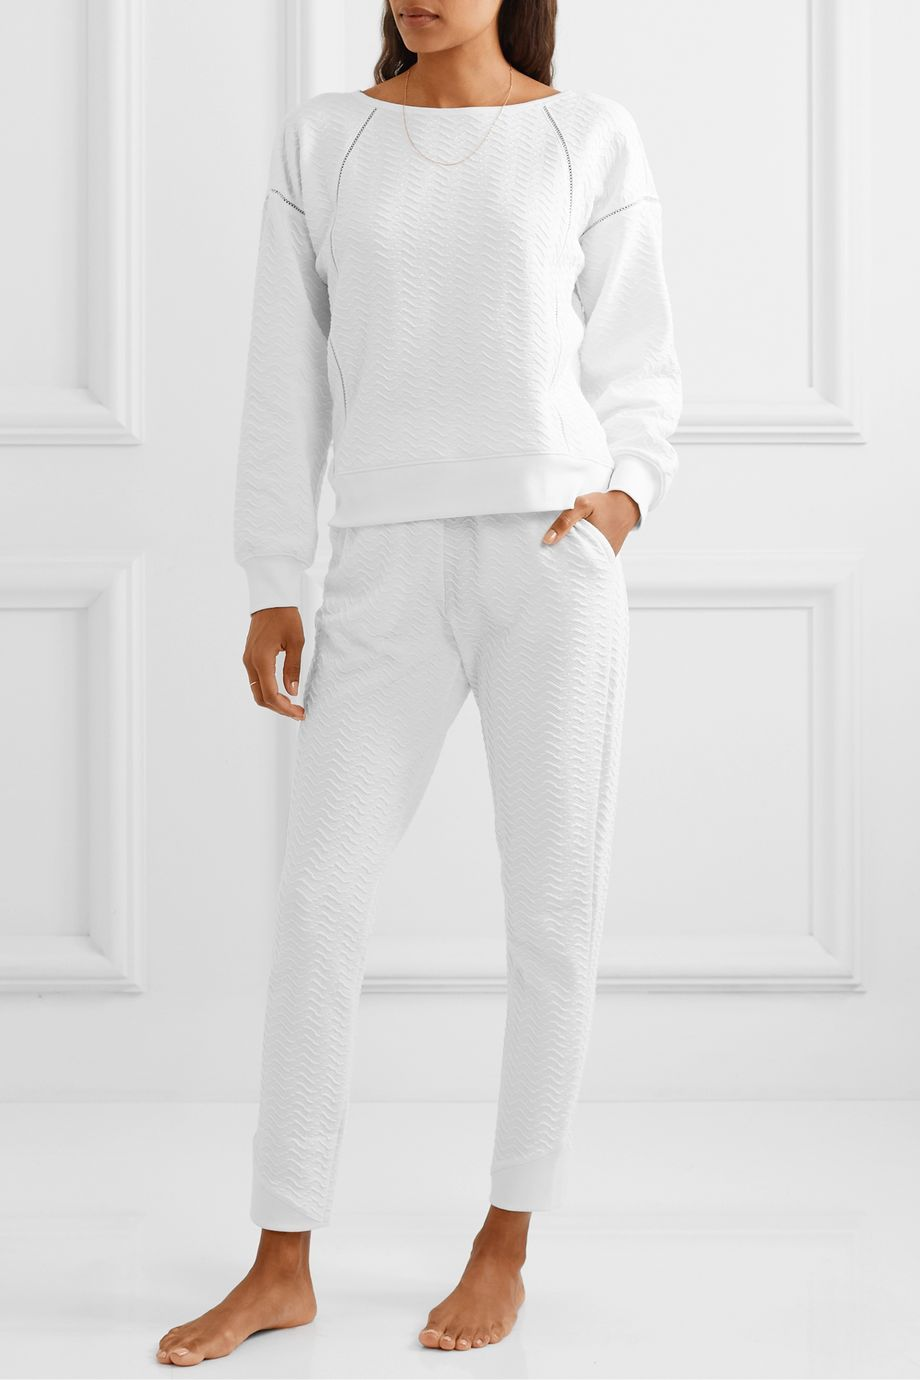 Skin Celina textured stretch-cotton track pants